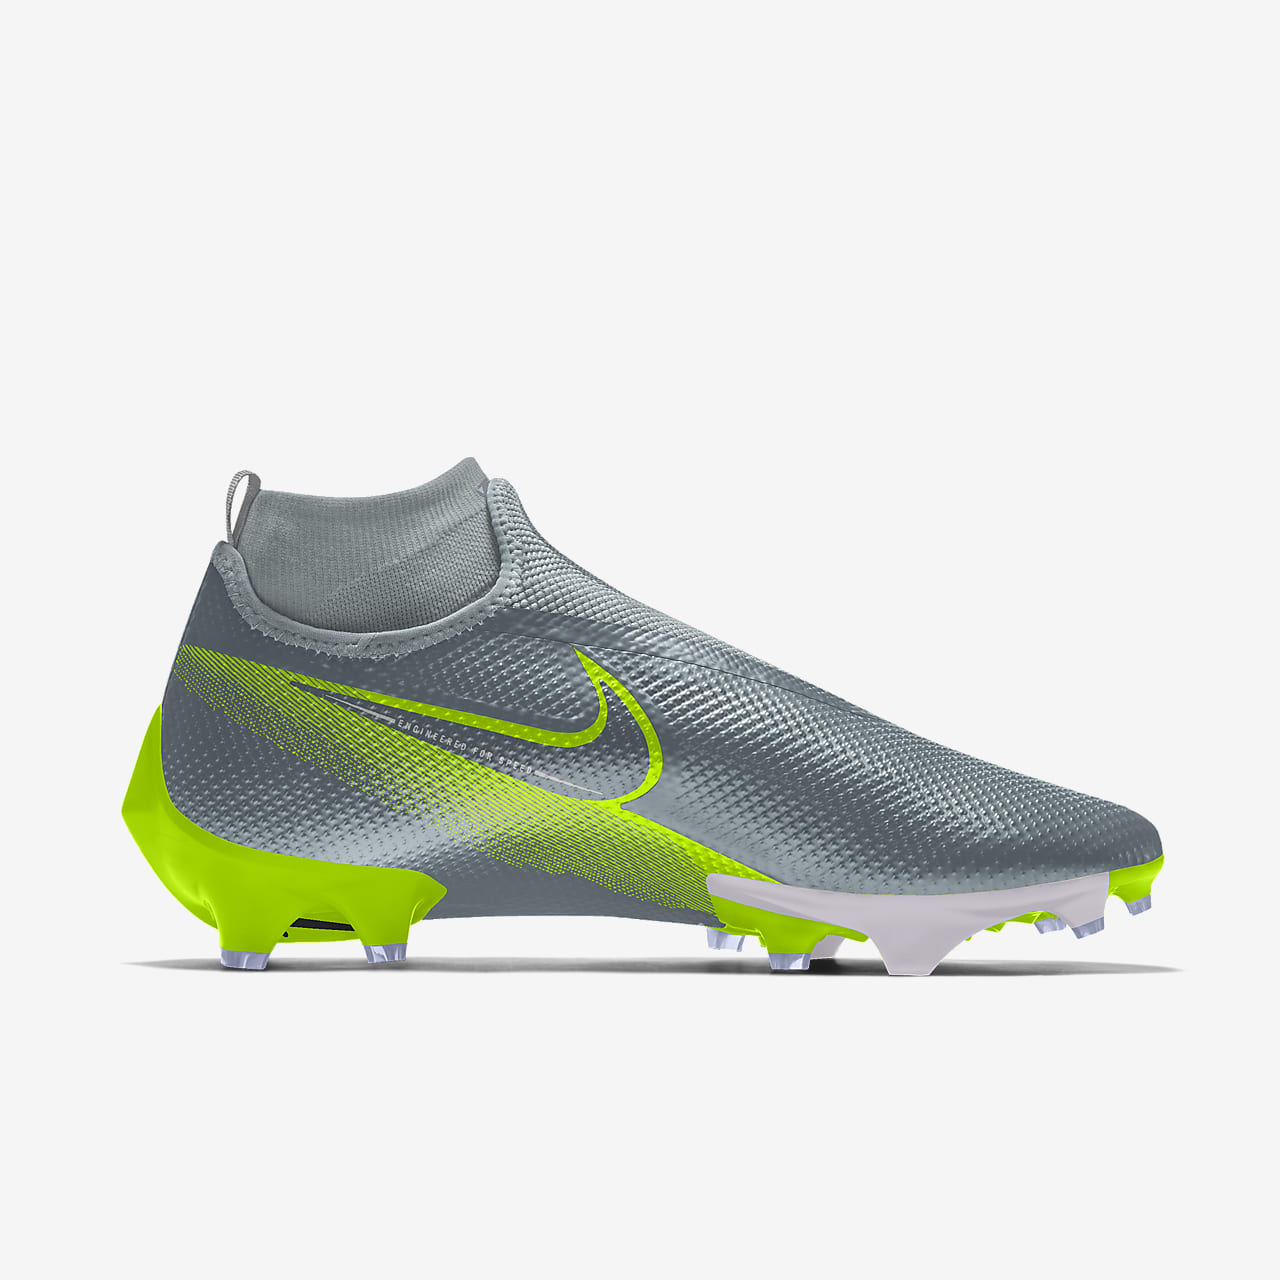 Nike Vapor Edge Pro 360 By You Custom